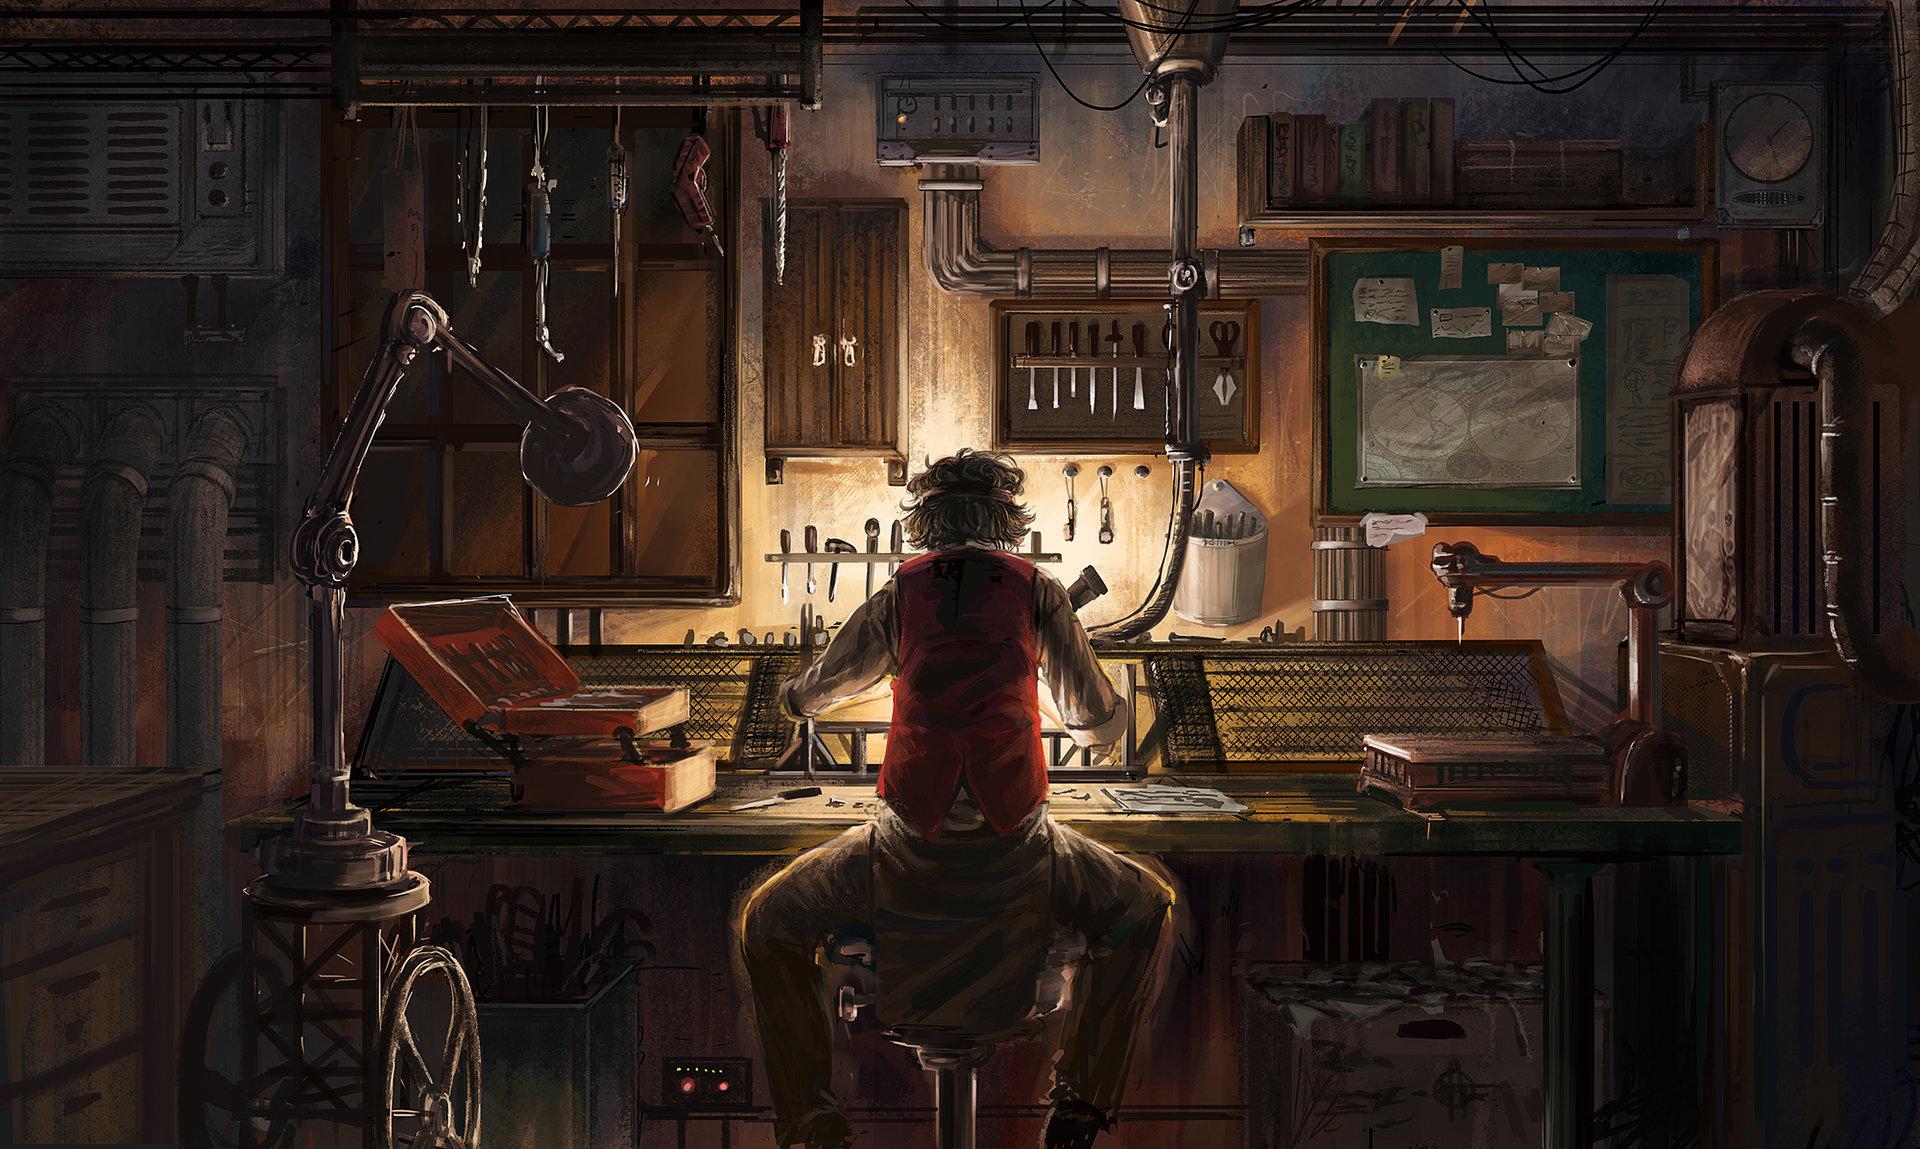 Engineer by Eiich Matsuba